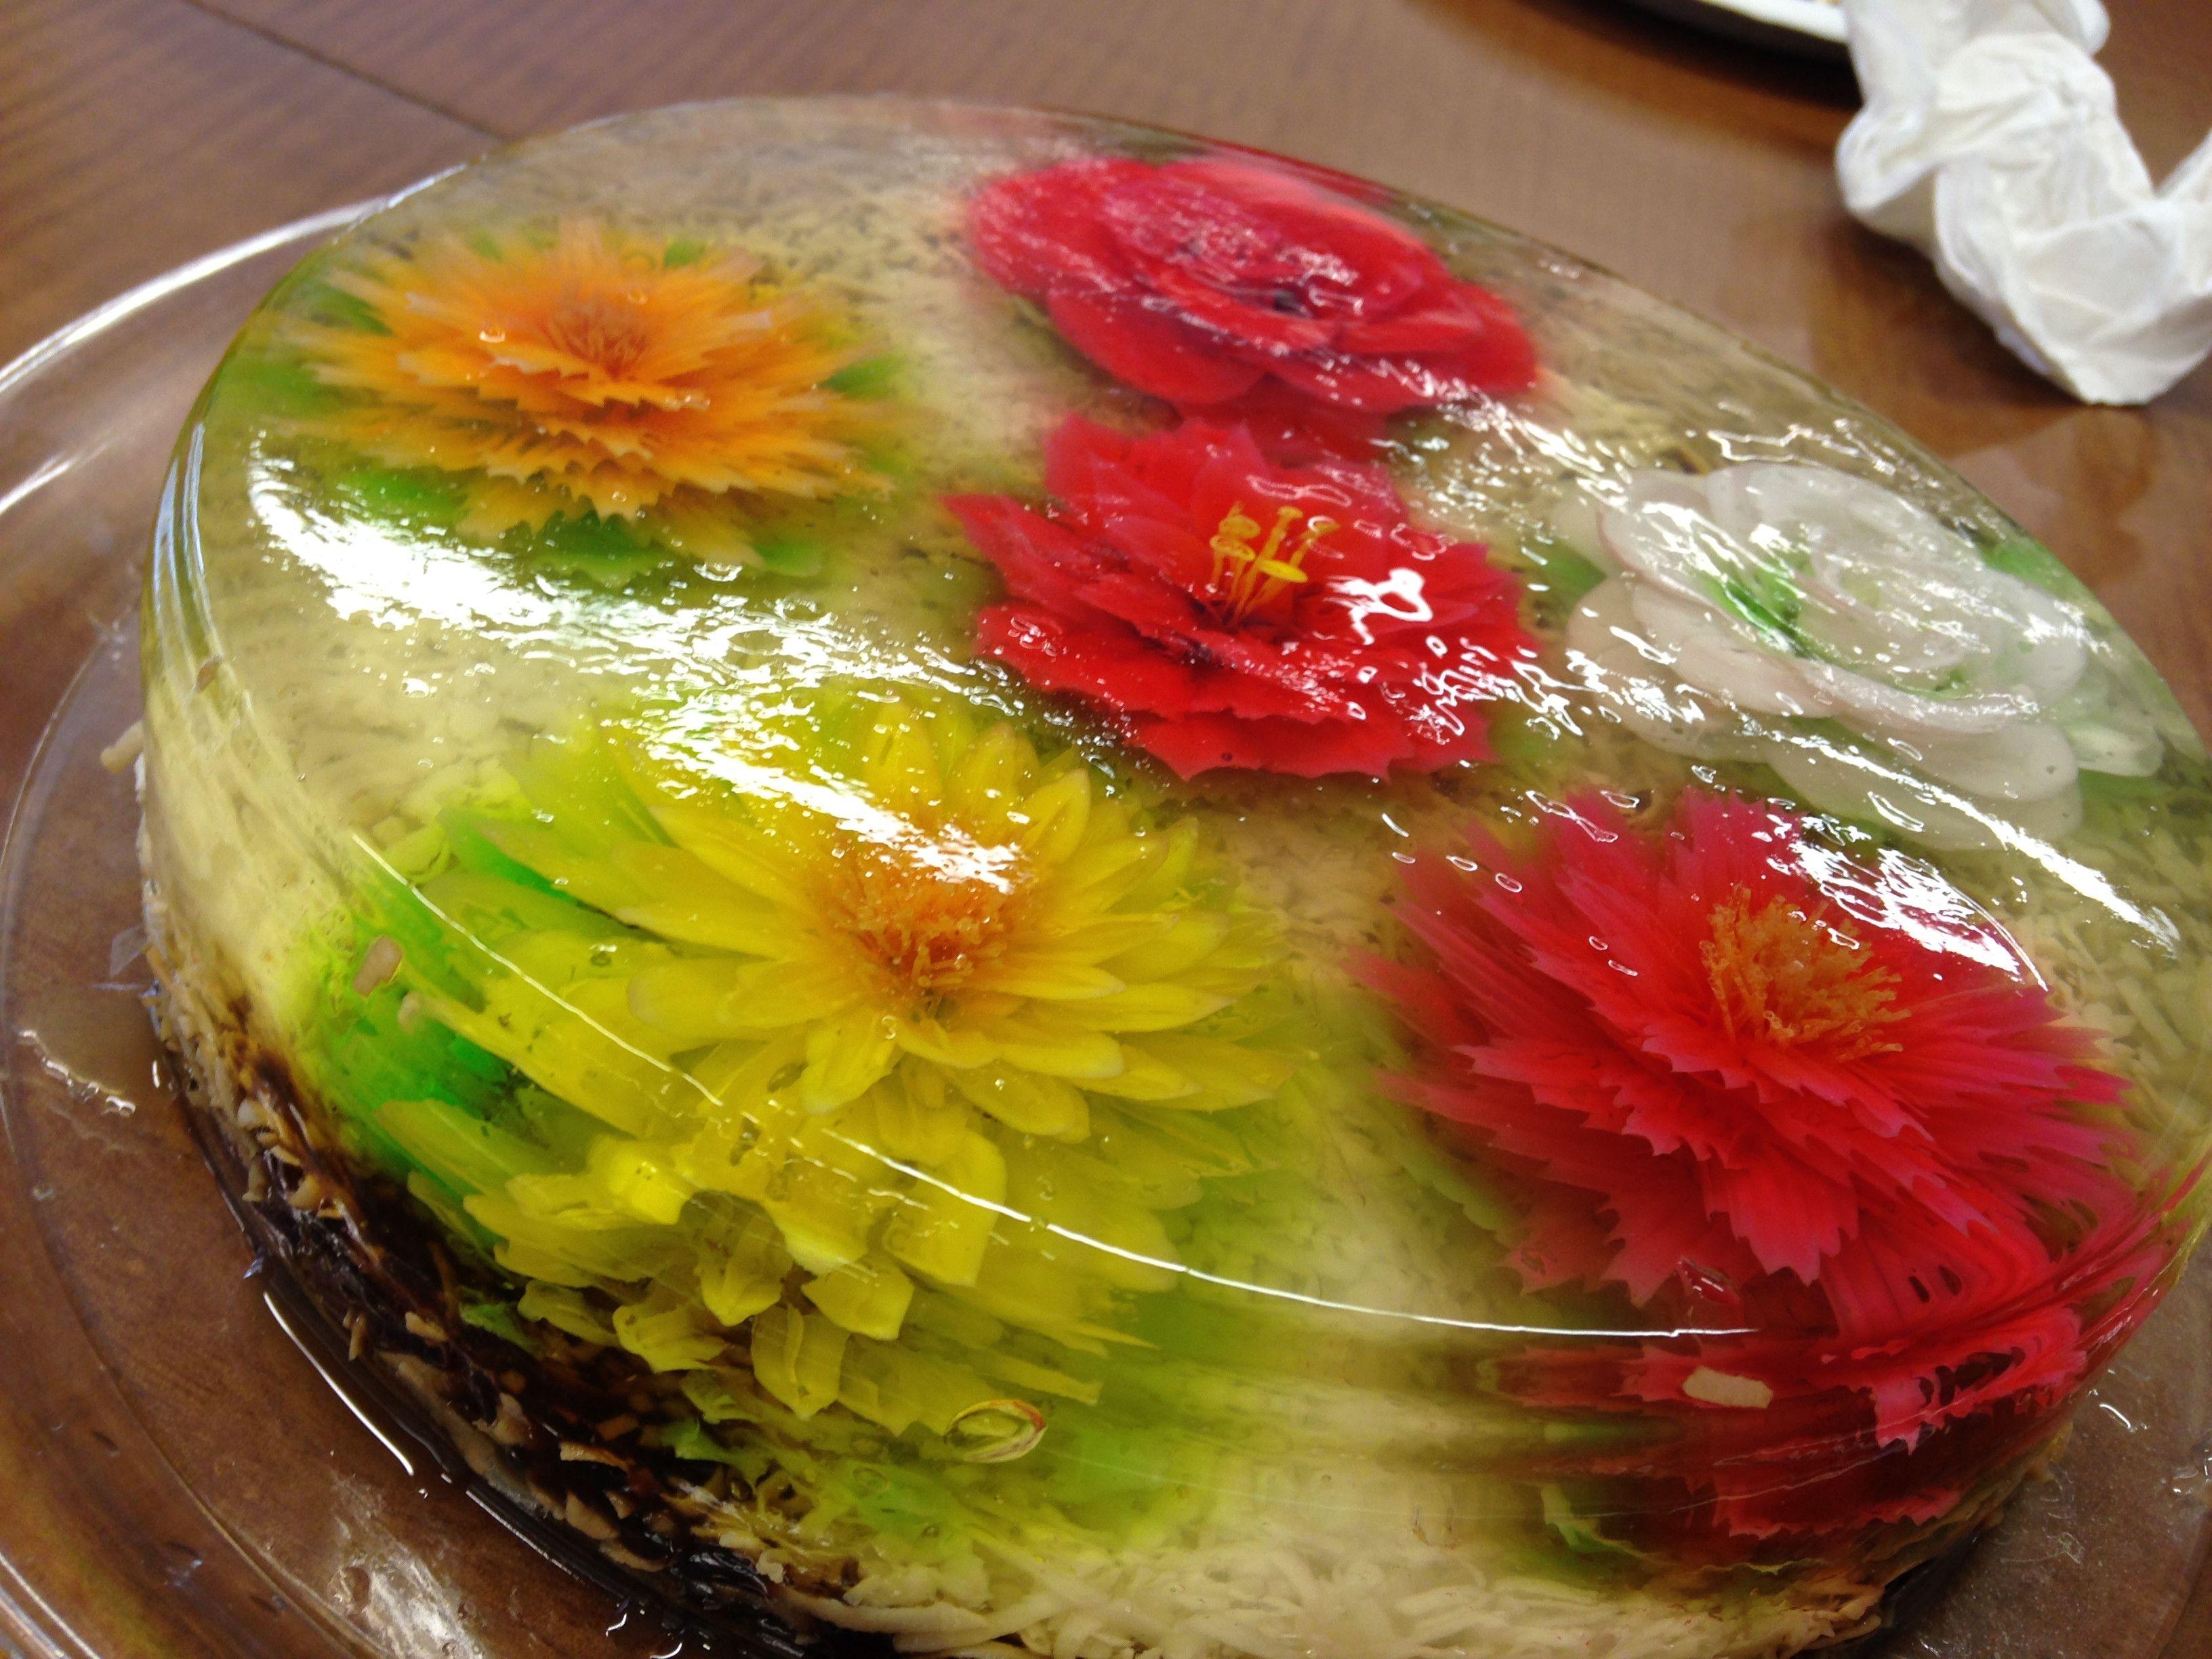 gelatin cake | the sweeter things | Pinterest | Cake, Food and Food art